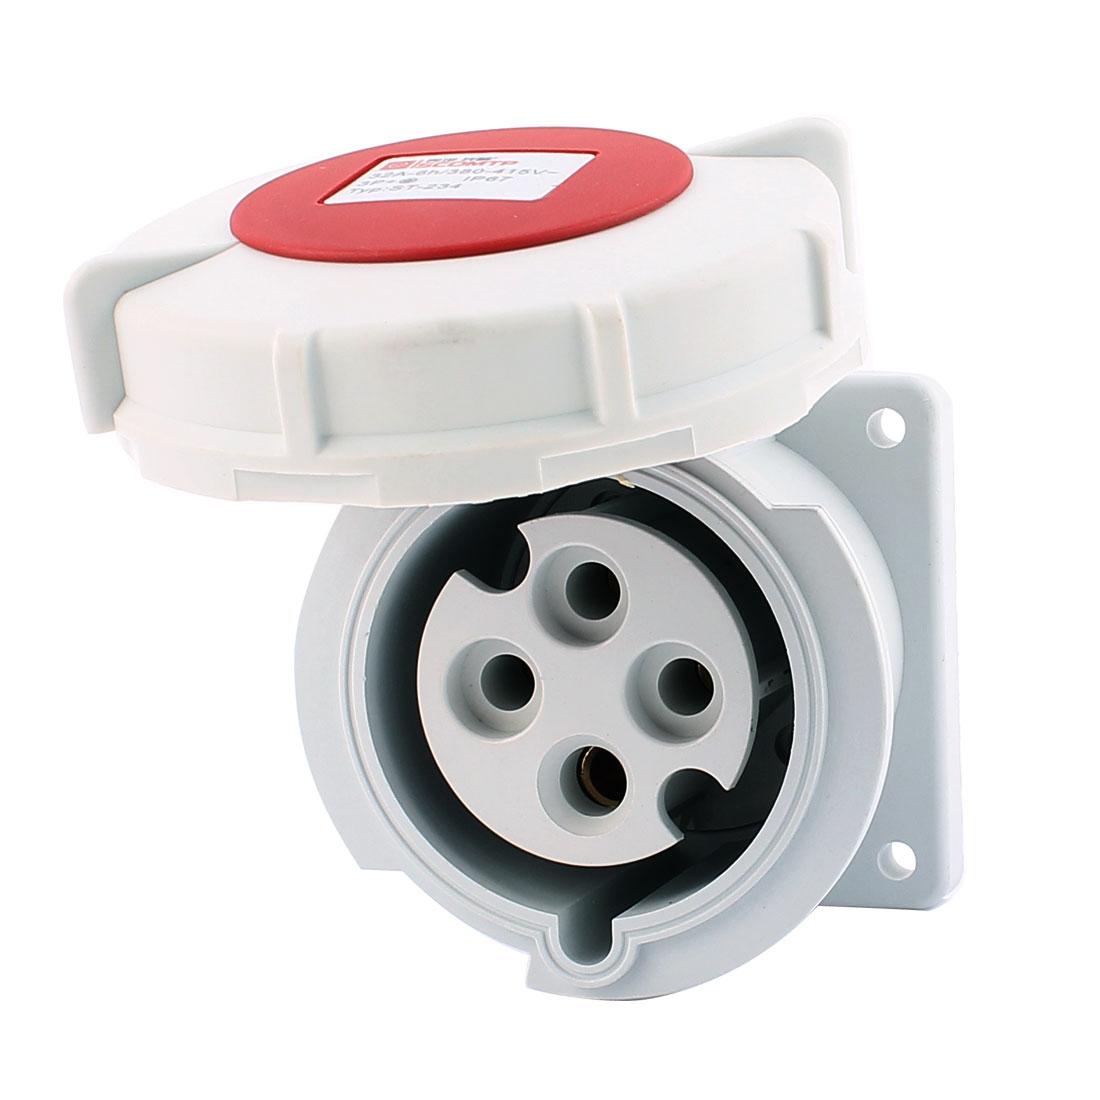 AC 380V-415V 32A IP67 3P+E 4-Terminal Female Industrial Straight Socket